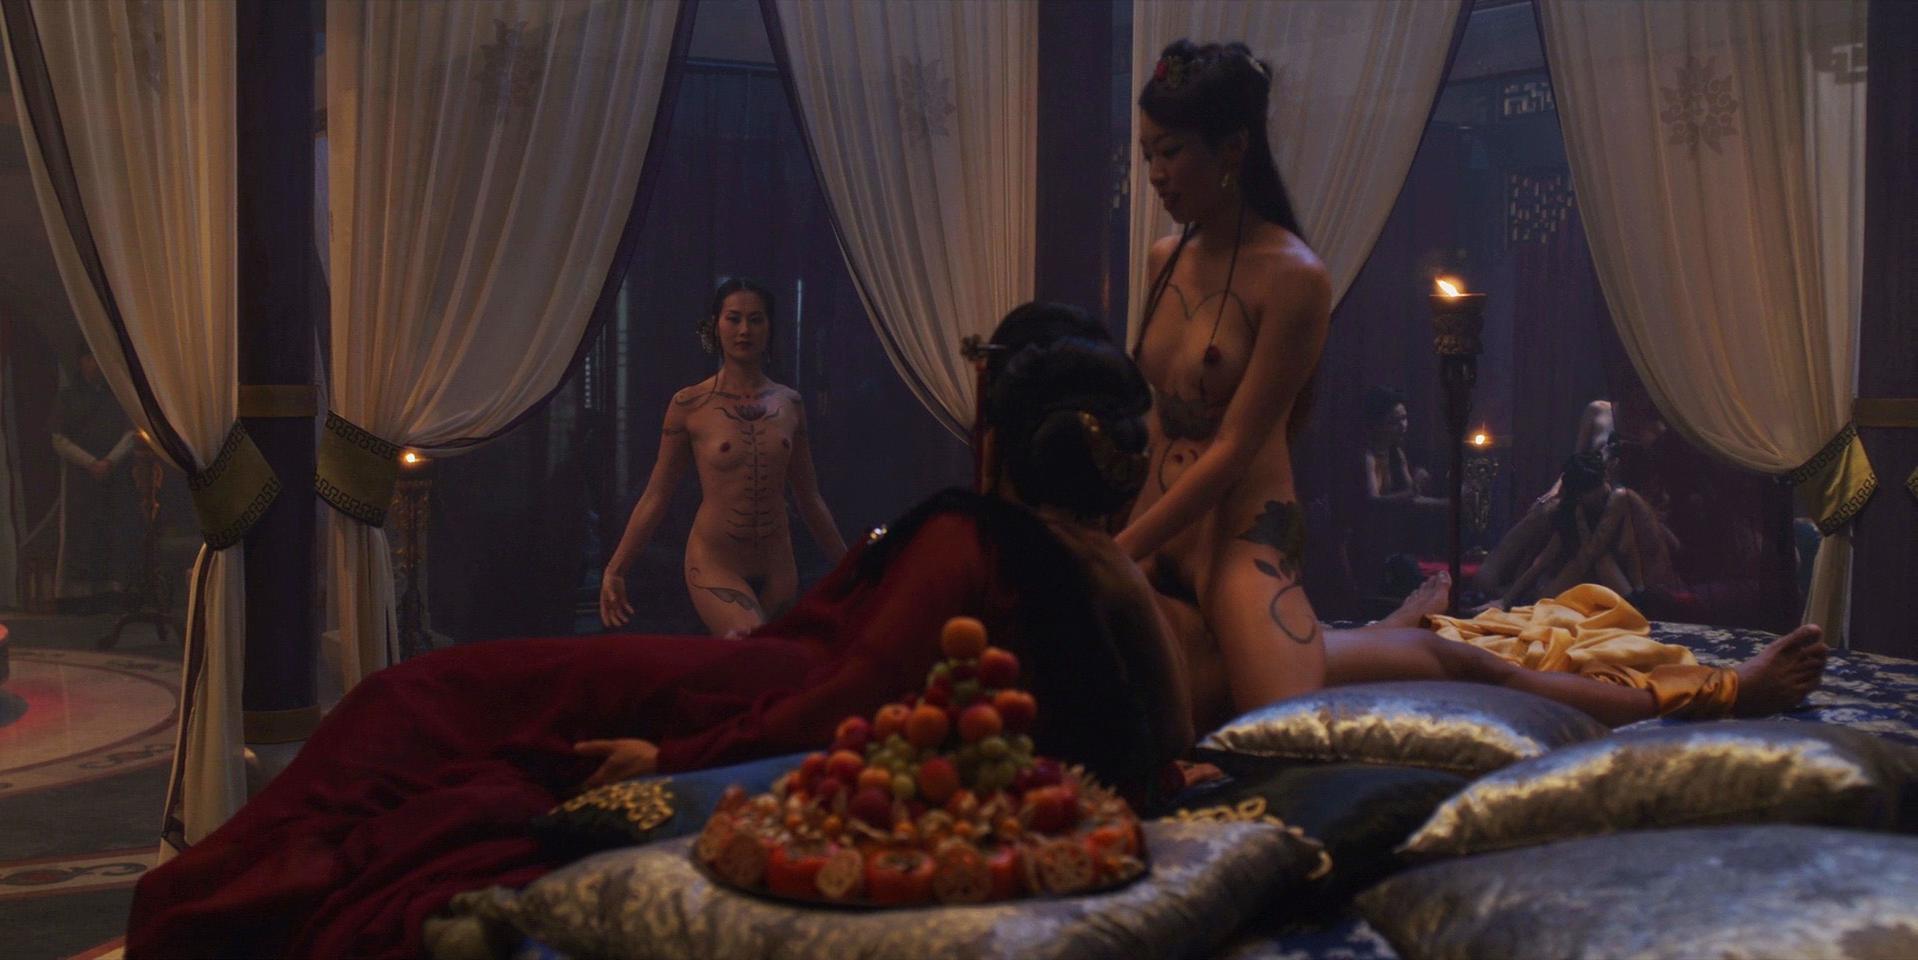 Olivia Cheng nude, Leifennie Ang nude - Marco Polo s01e06 (2014)